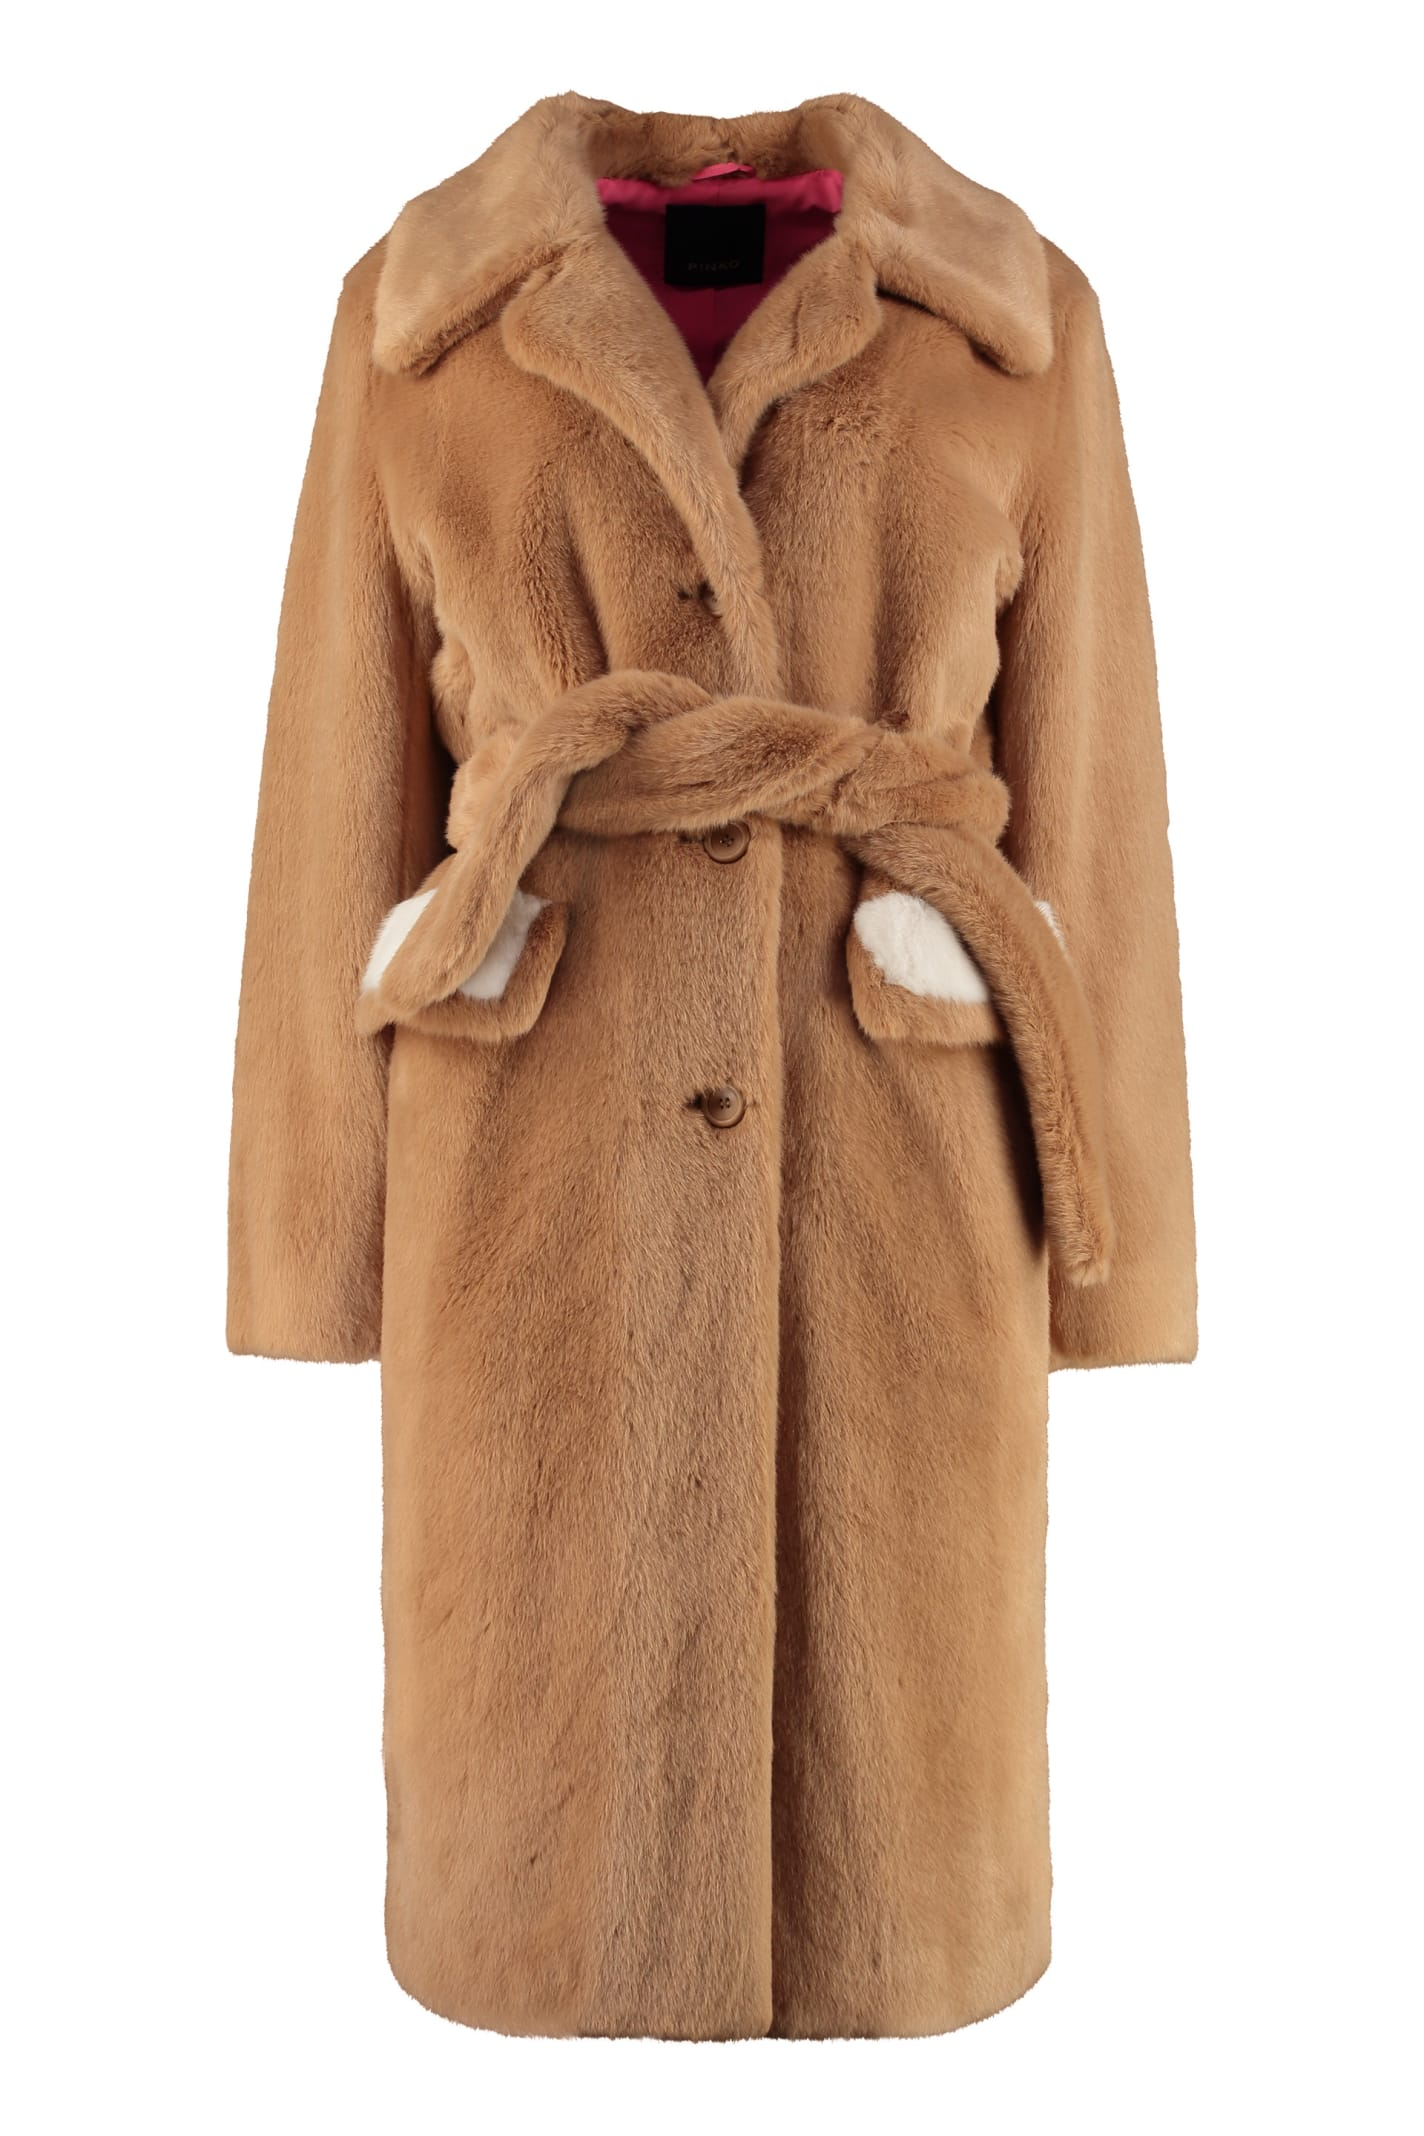 Pinko Oziare Faux Fur Coat